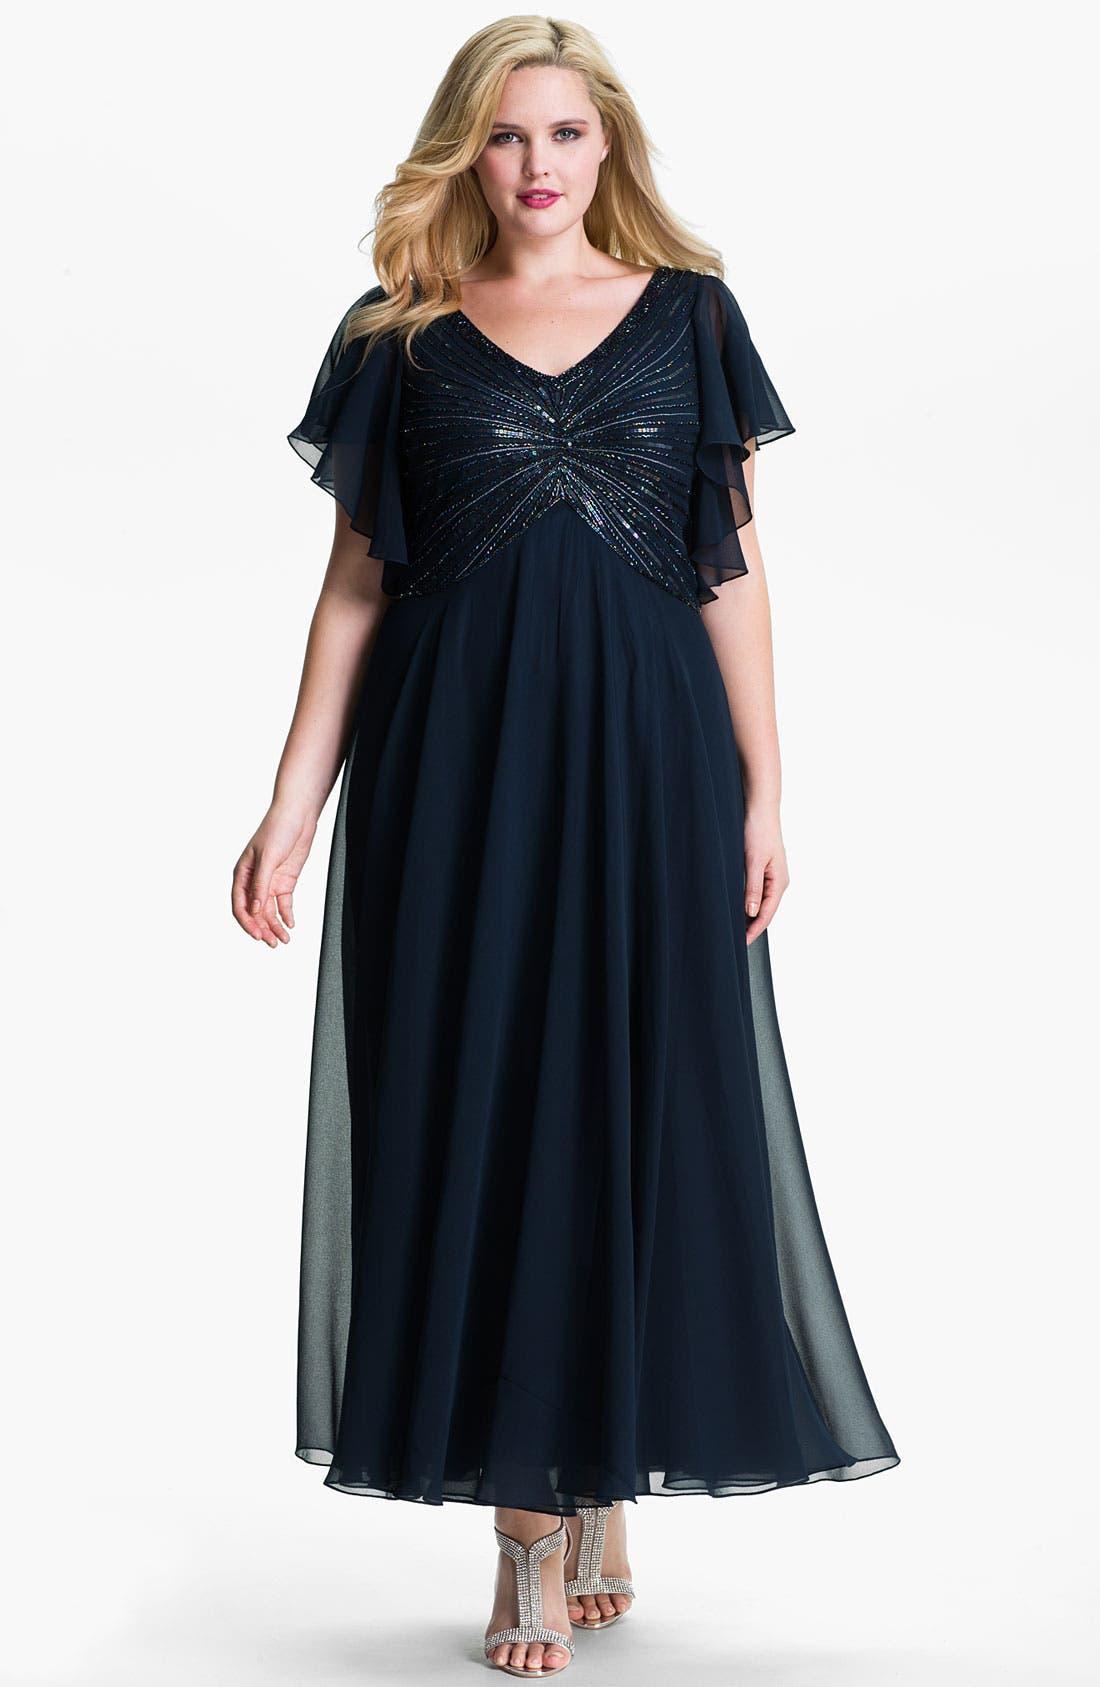 Alternate Image 1 Selected - J Kara V-Neck Sequin Bodice Dress (Plus)